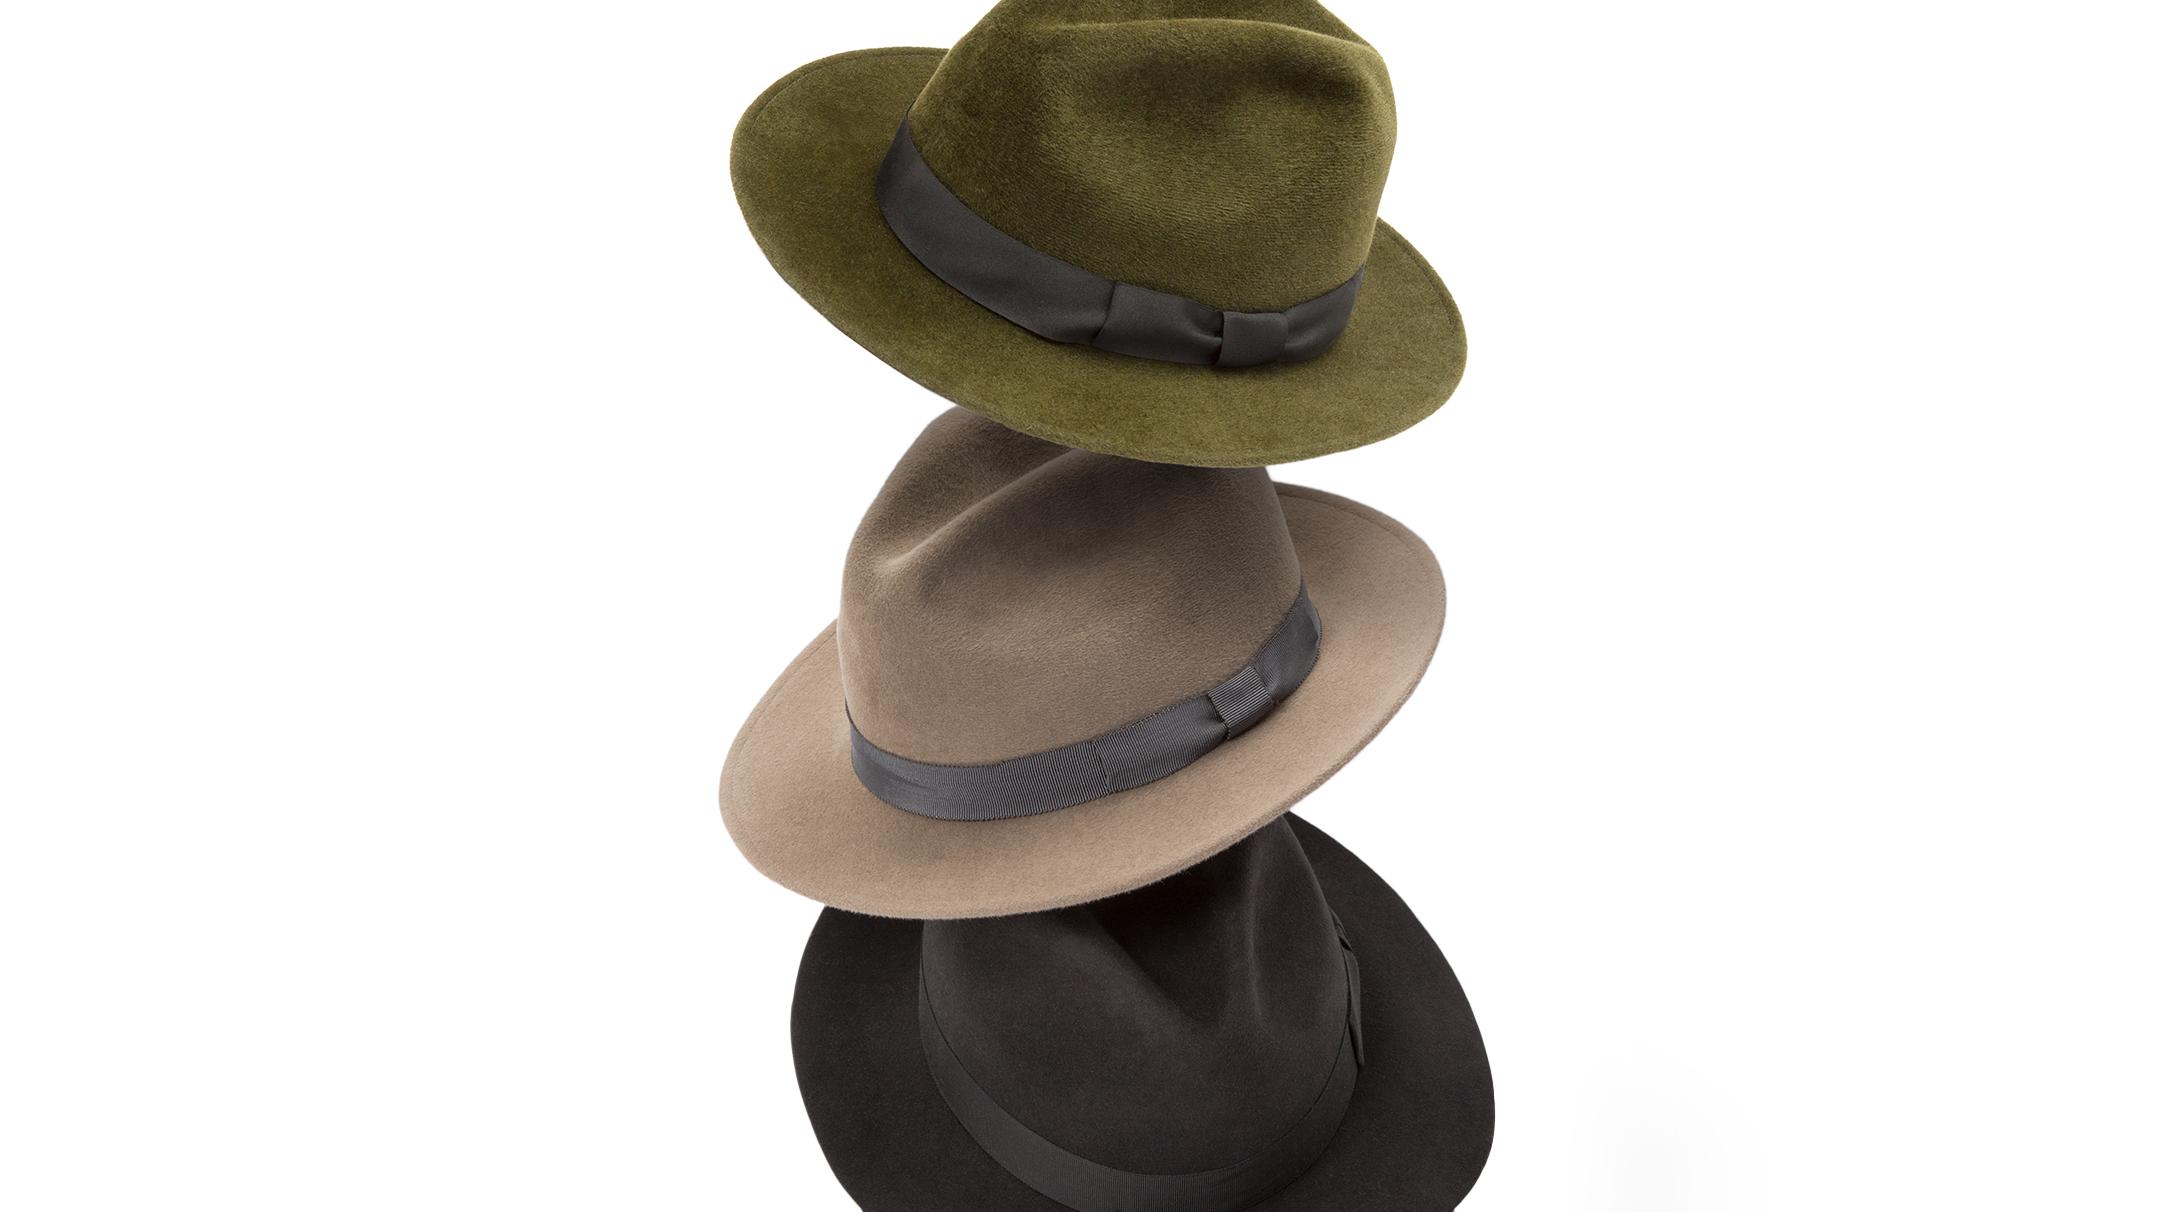 dhcreativeworks-hat-style-shot1.jpg